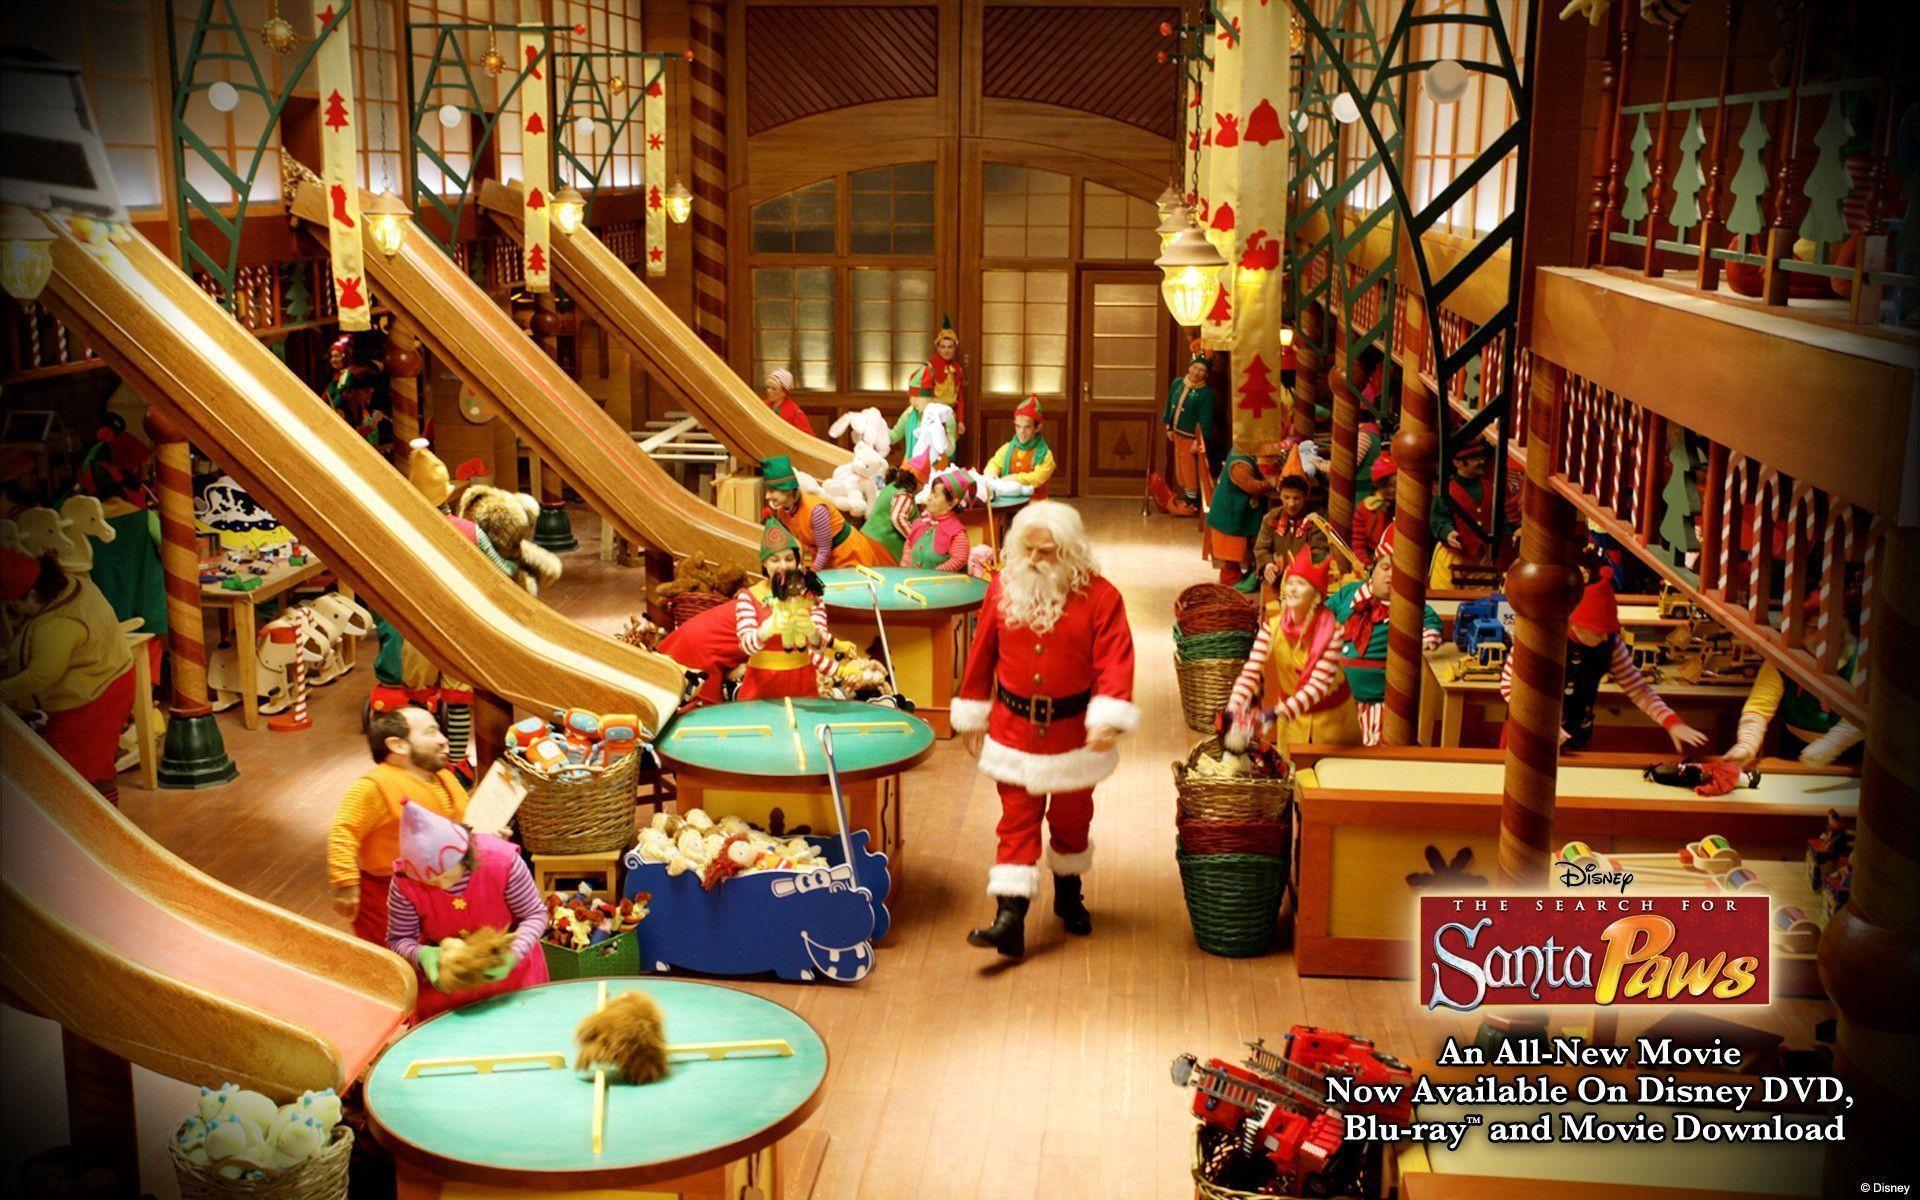 St Nicholas Santa Claus Wallpapers for Windows 10   Windows 8.1 .